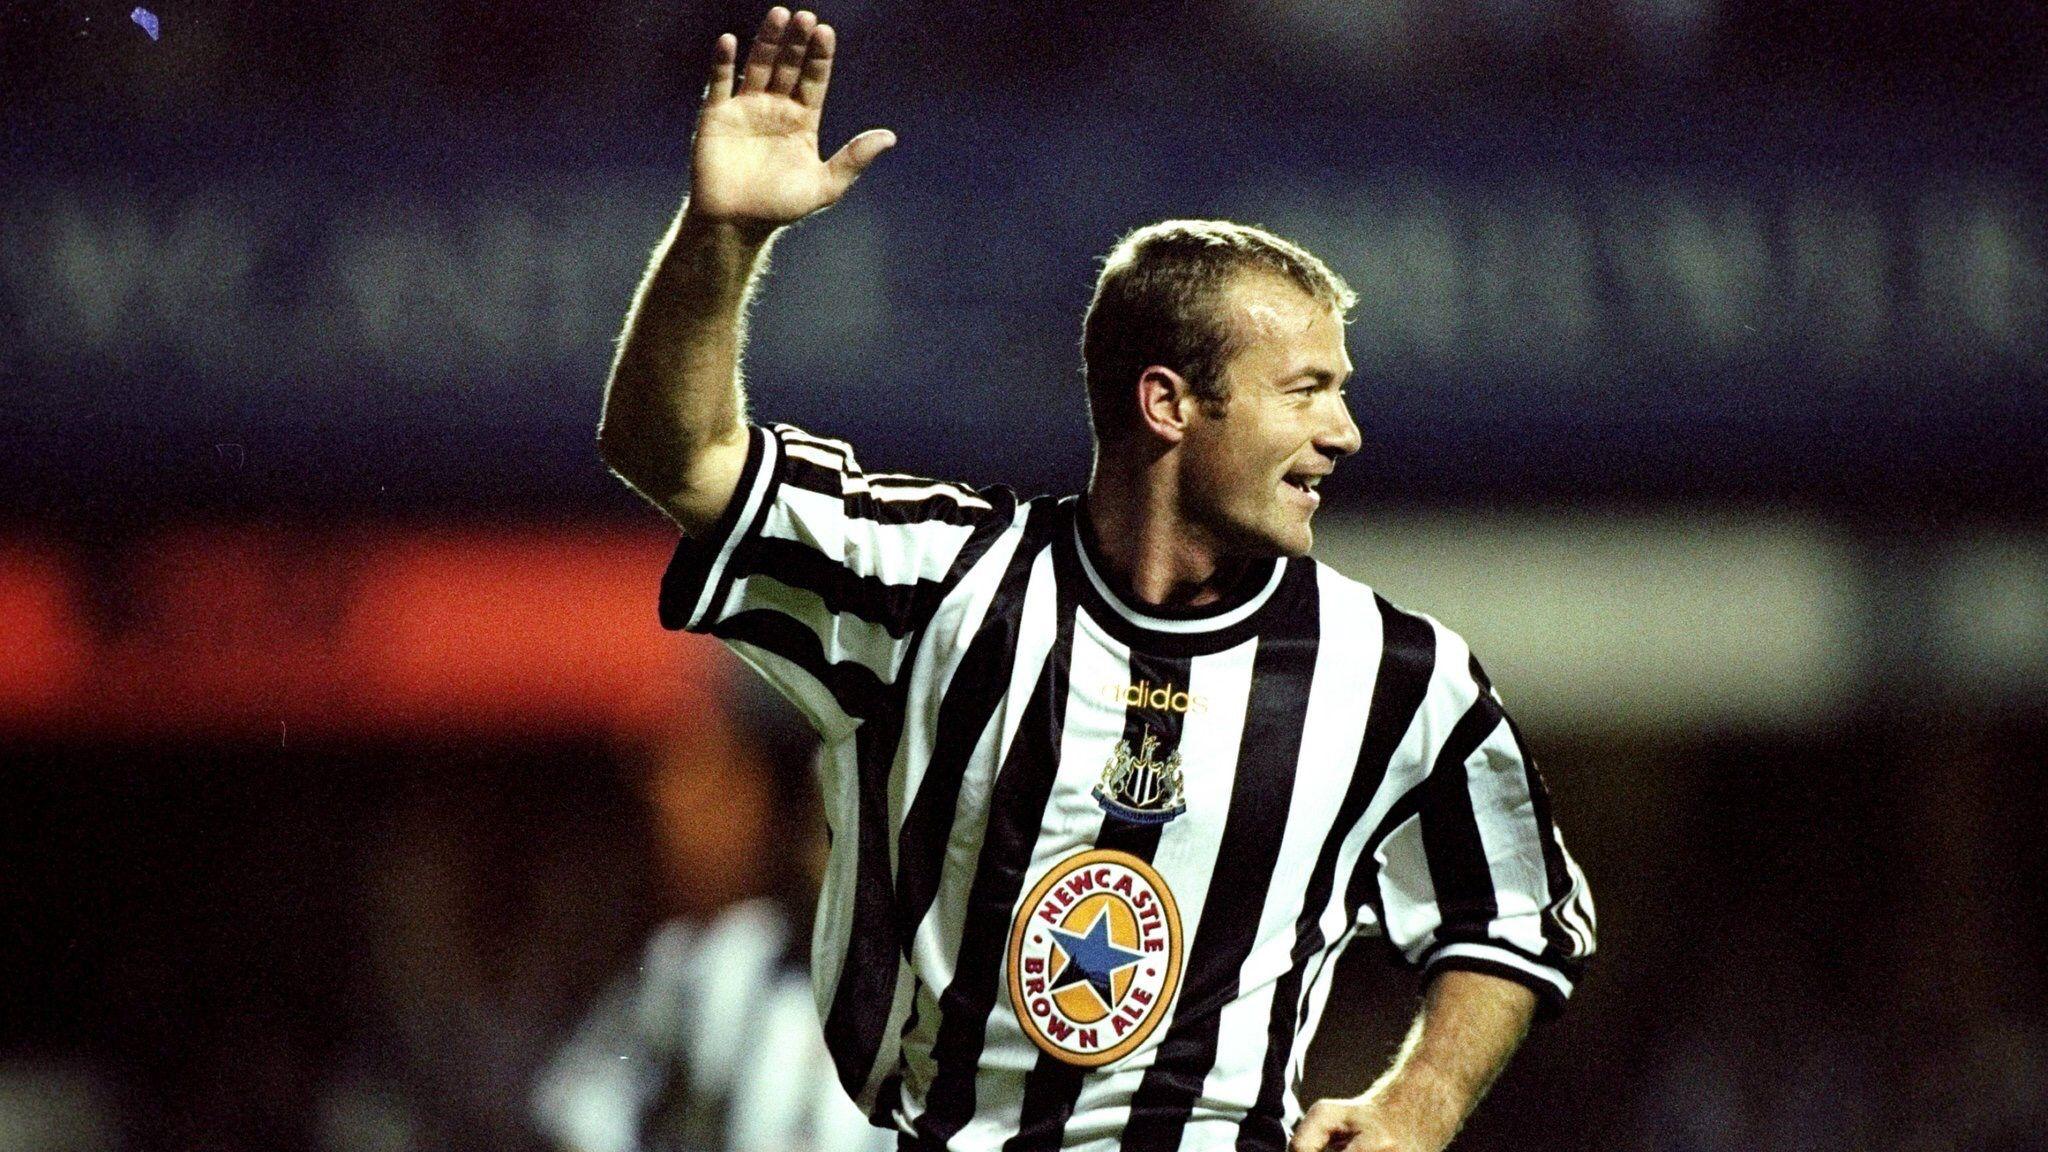 Happy Birthday to the Premier League s greatest ever goal scorer, Alan Shearer